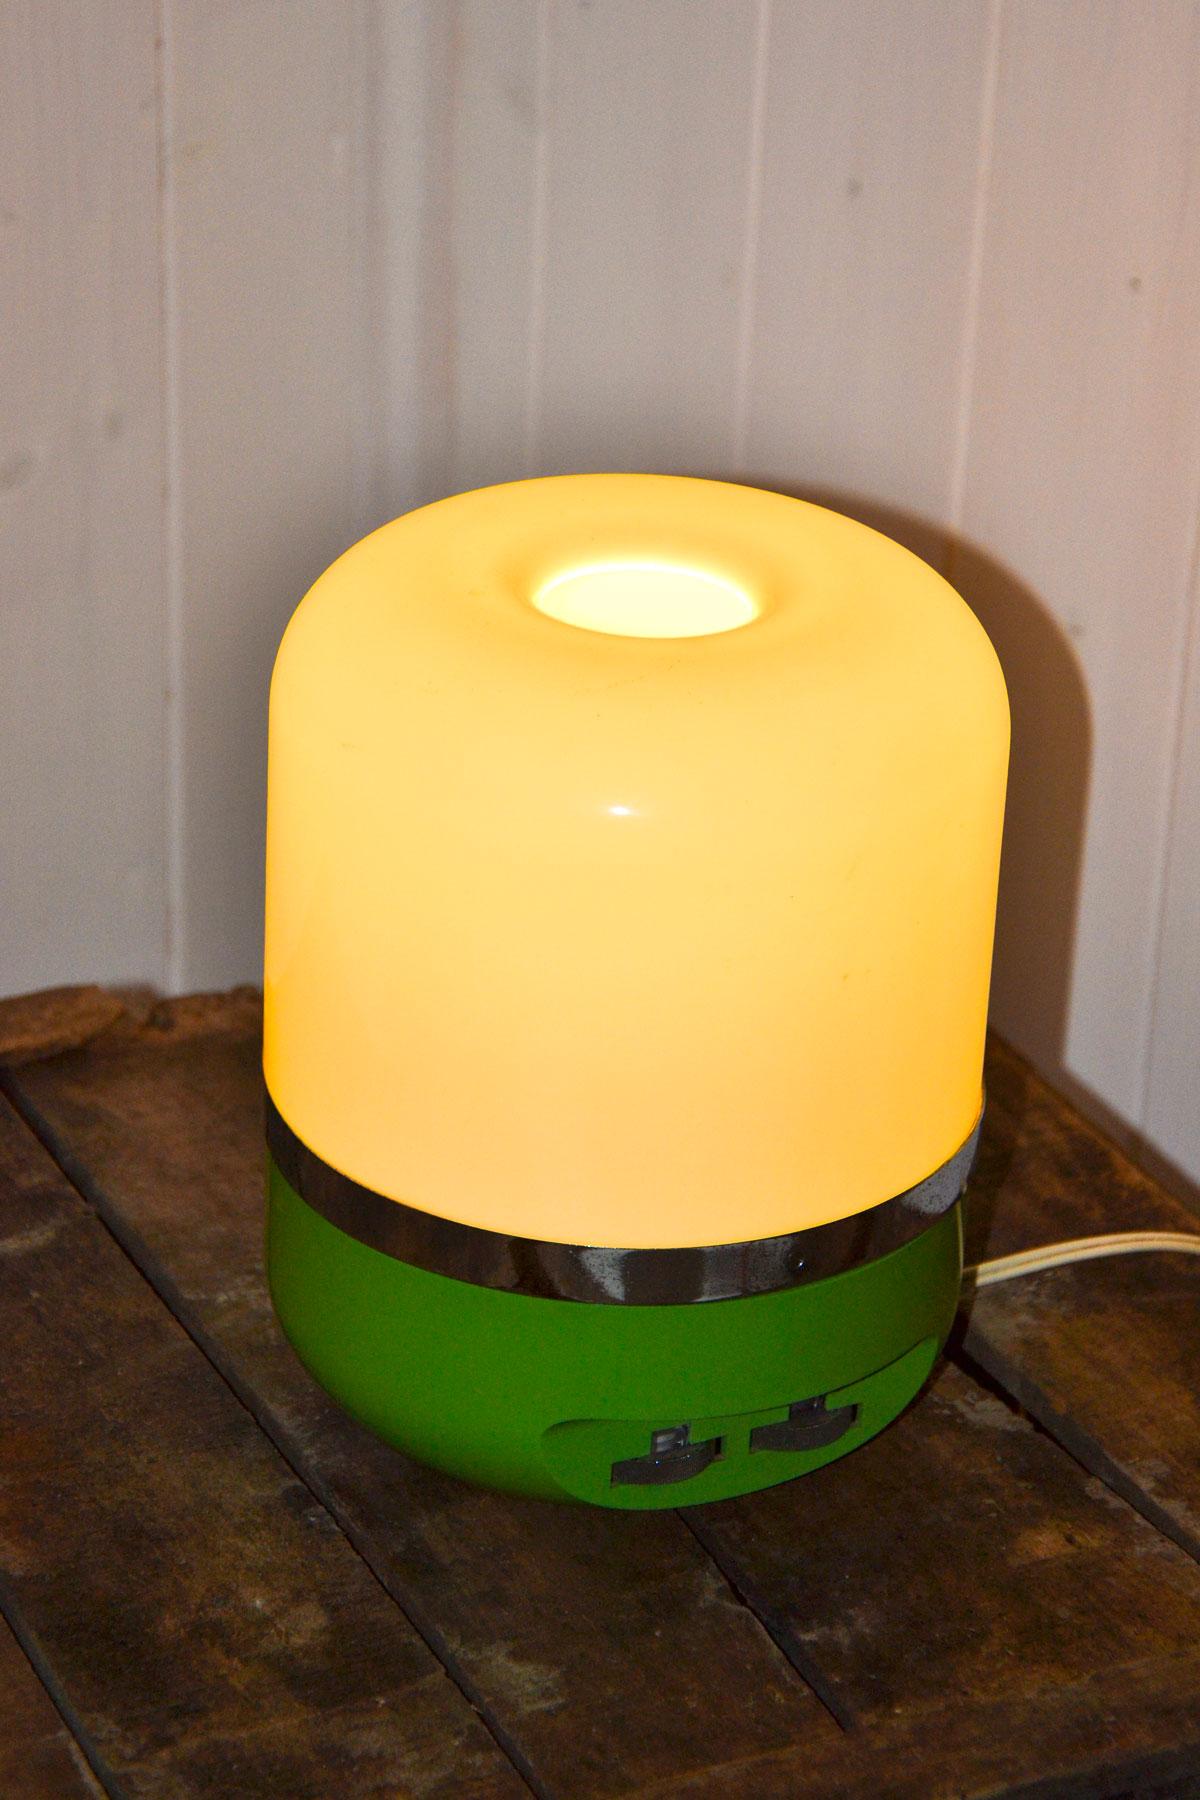 lampada radio anni 70 verde lampada radio anni 70 verde lampada radio ...